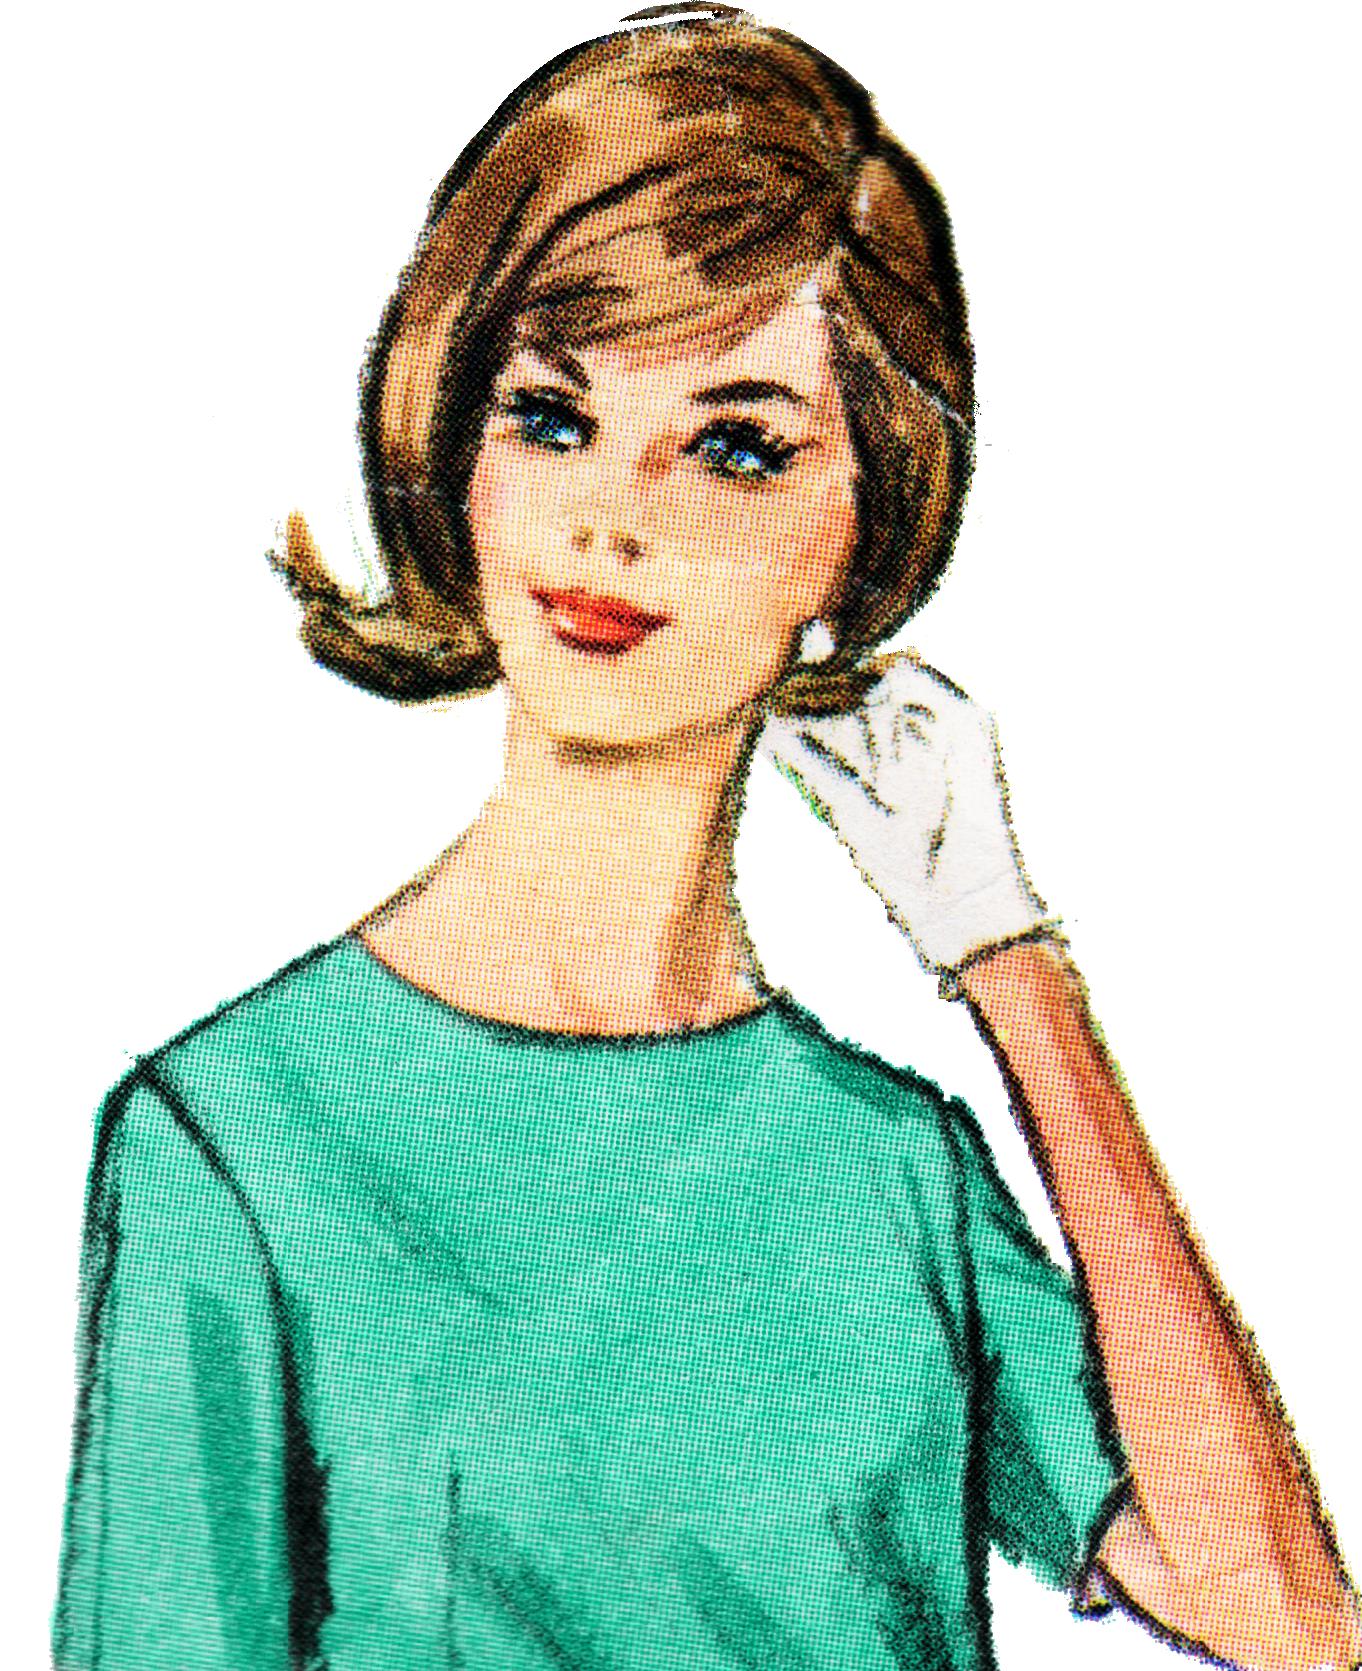 vintage lady clipart - photo #25